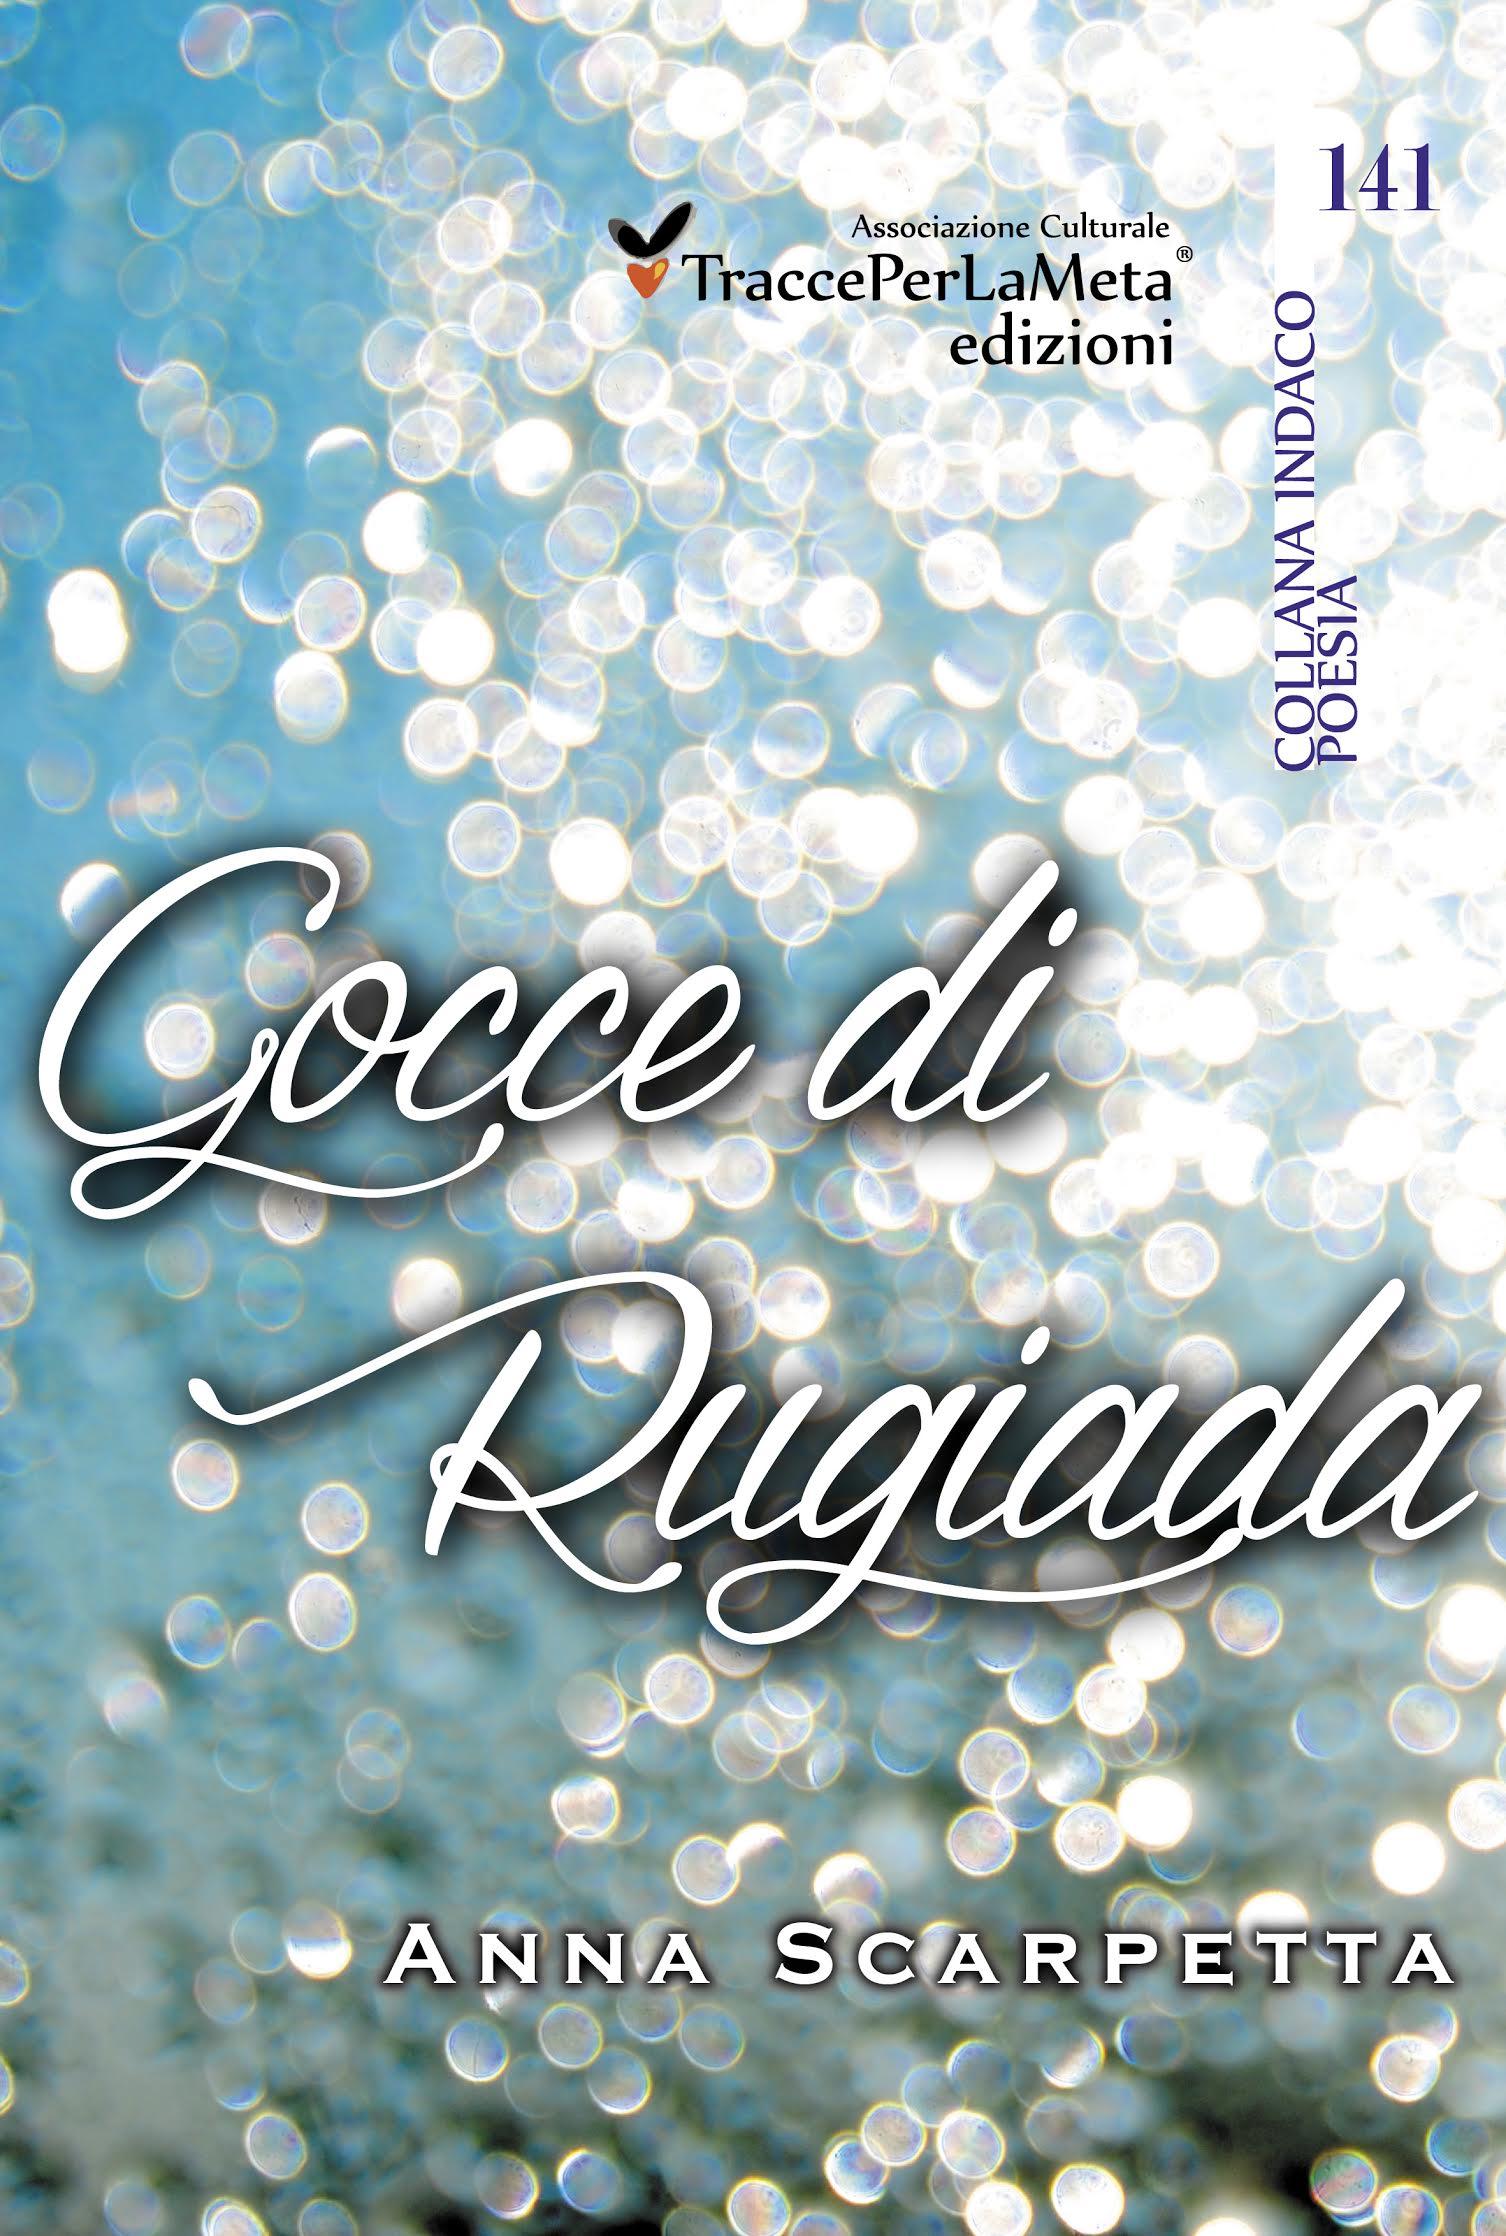 Esce GOCCE DI RUGIADA in ebook che Anna Scarpetta trasforma in delicate poesie